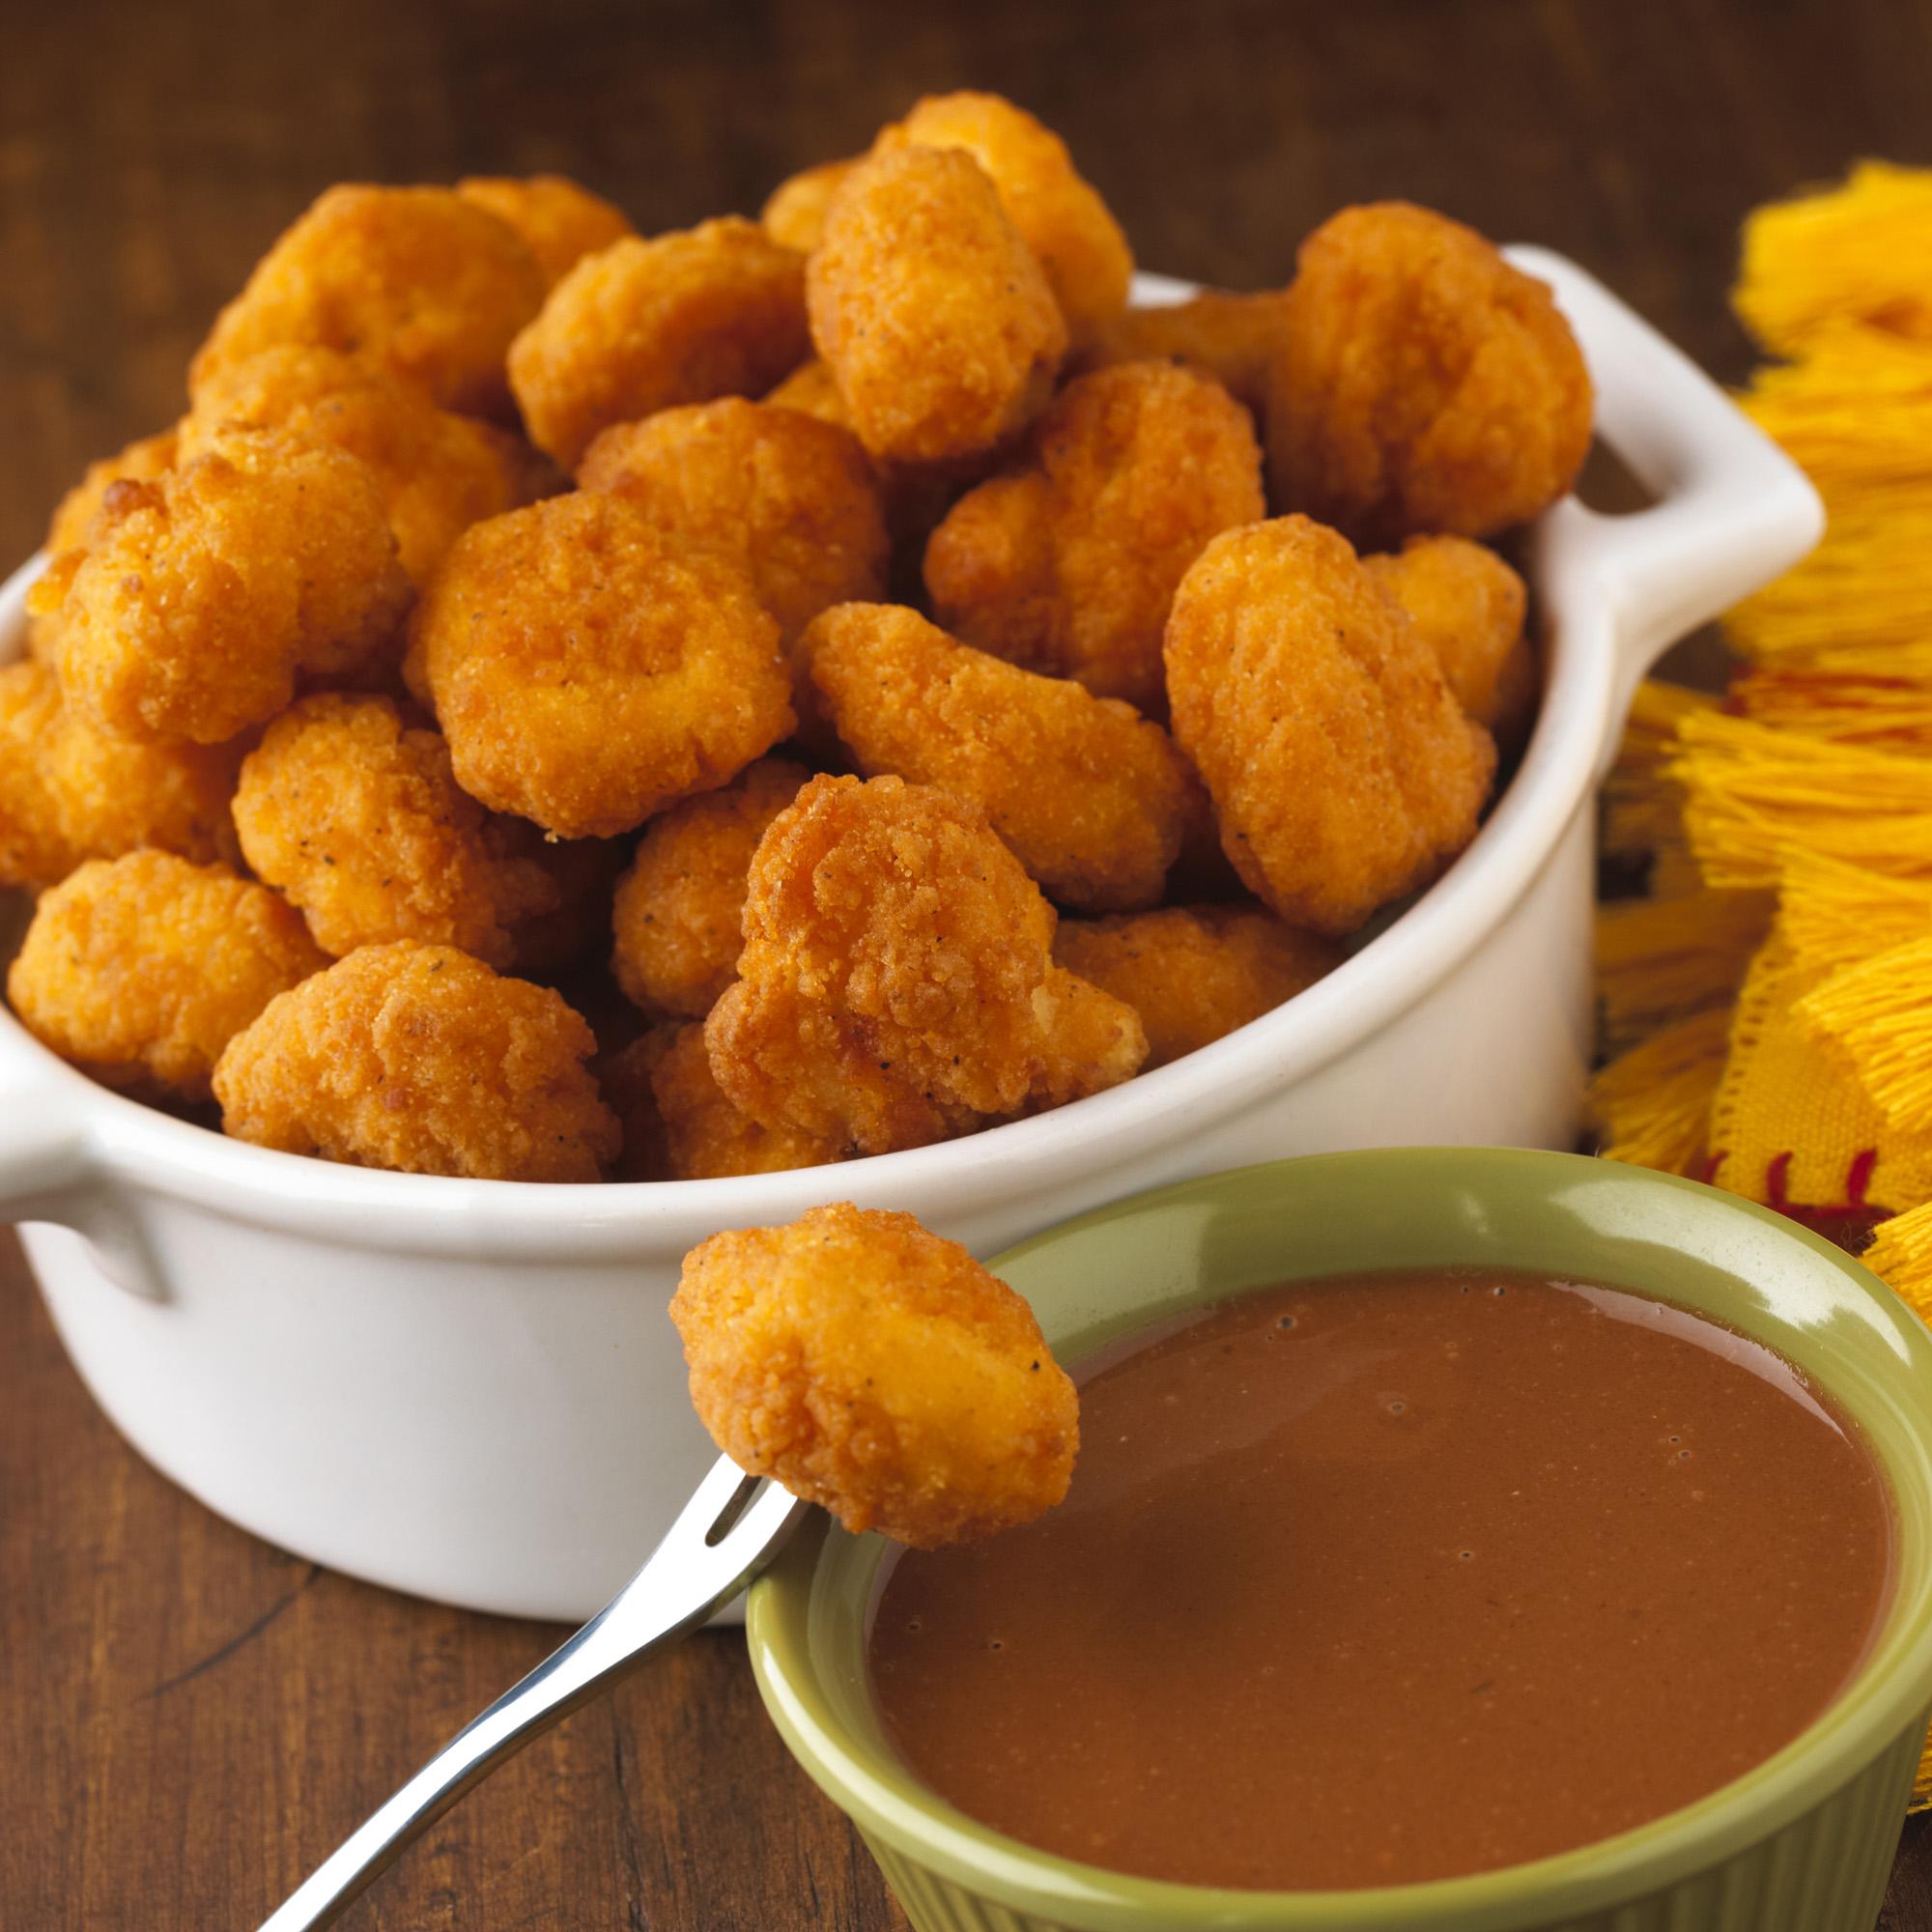 Popcorn con salsa agridulce